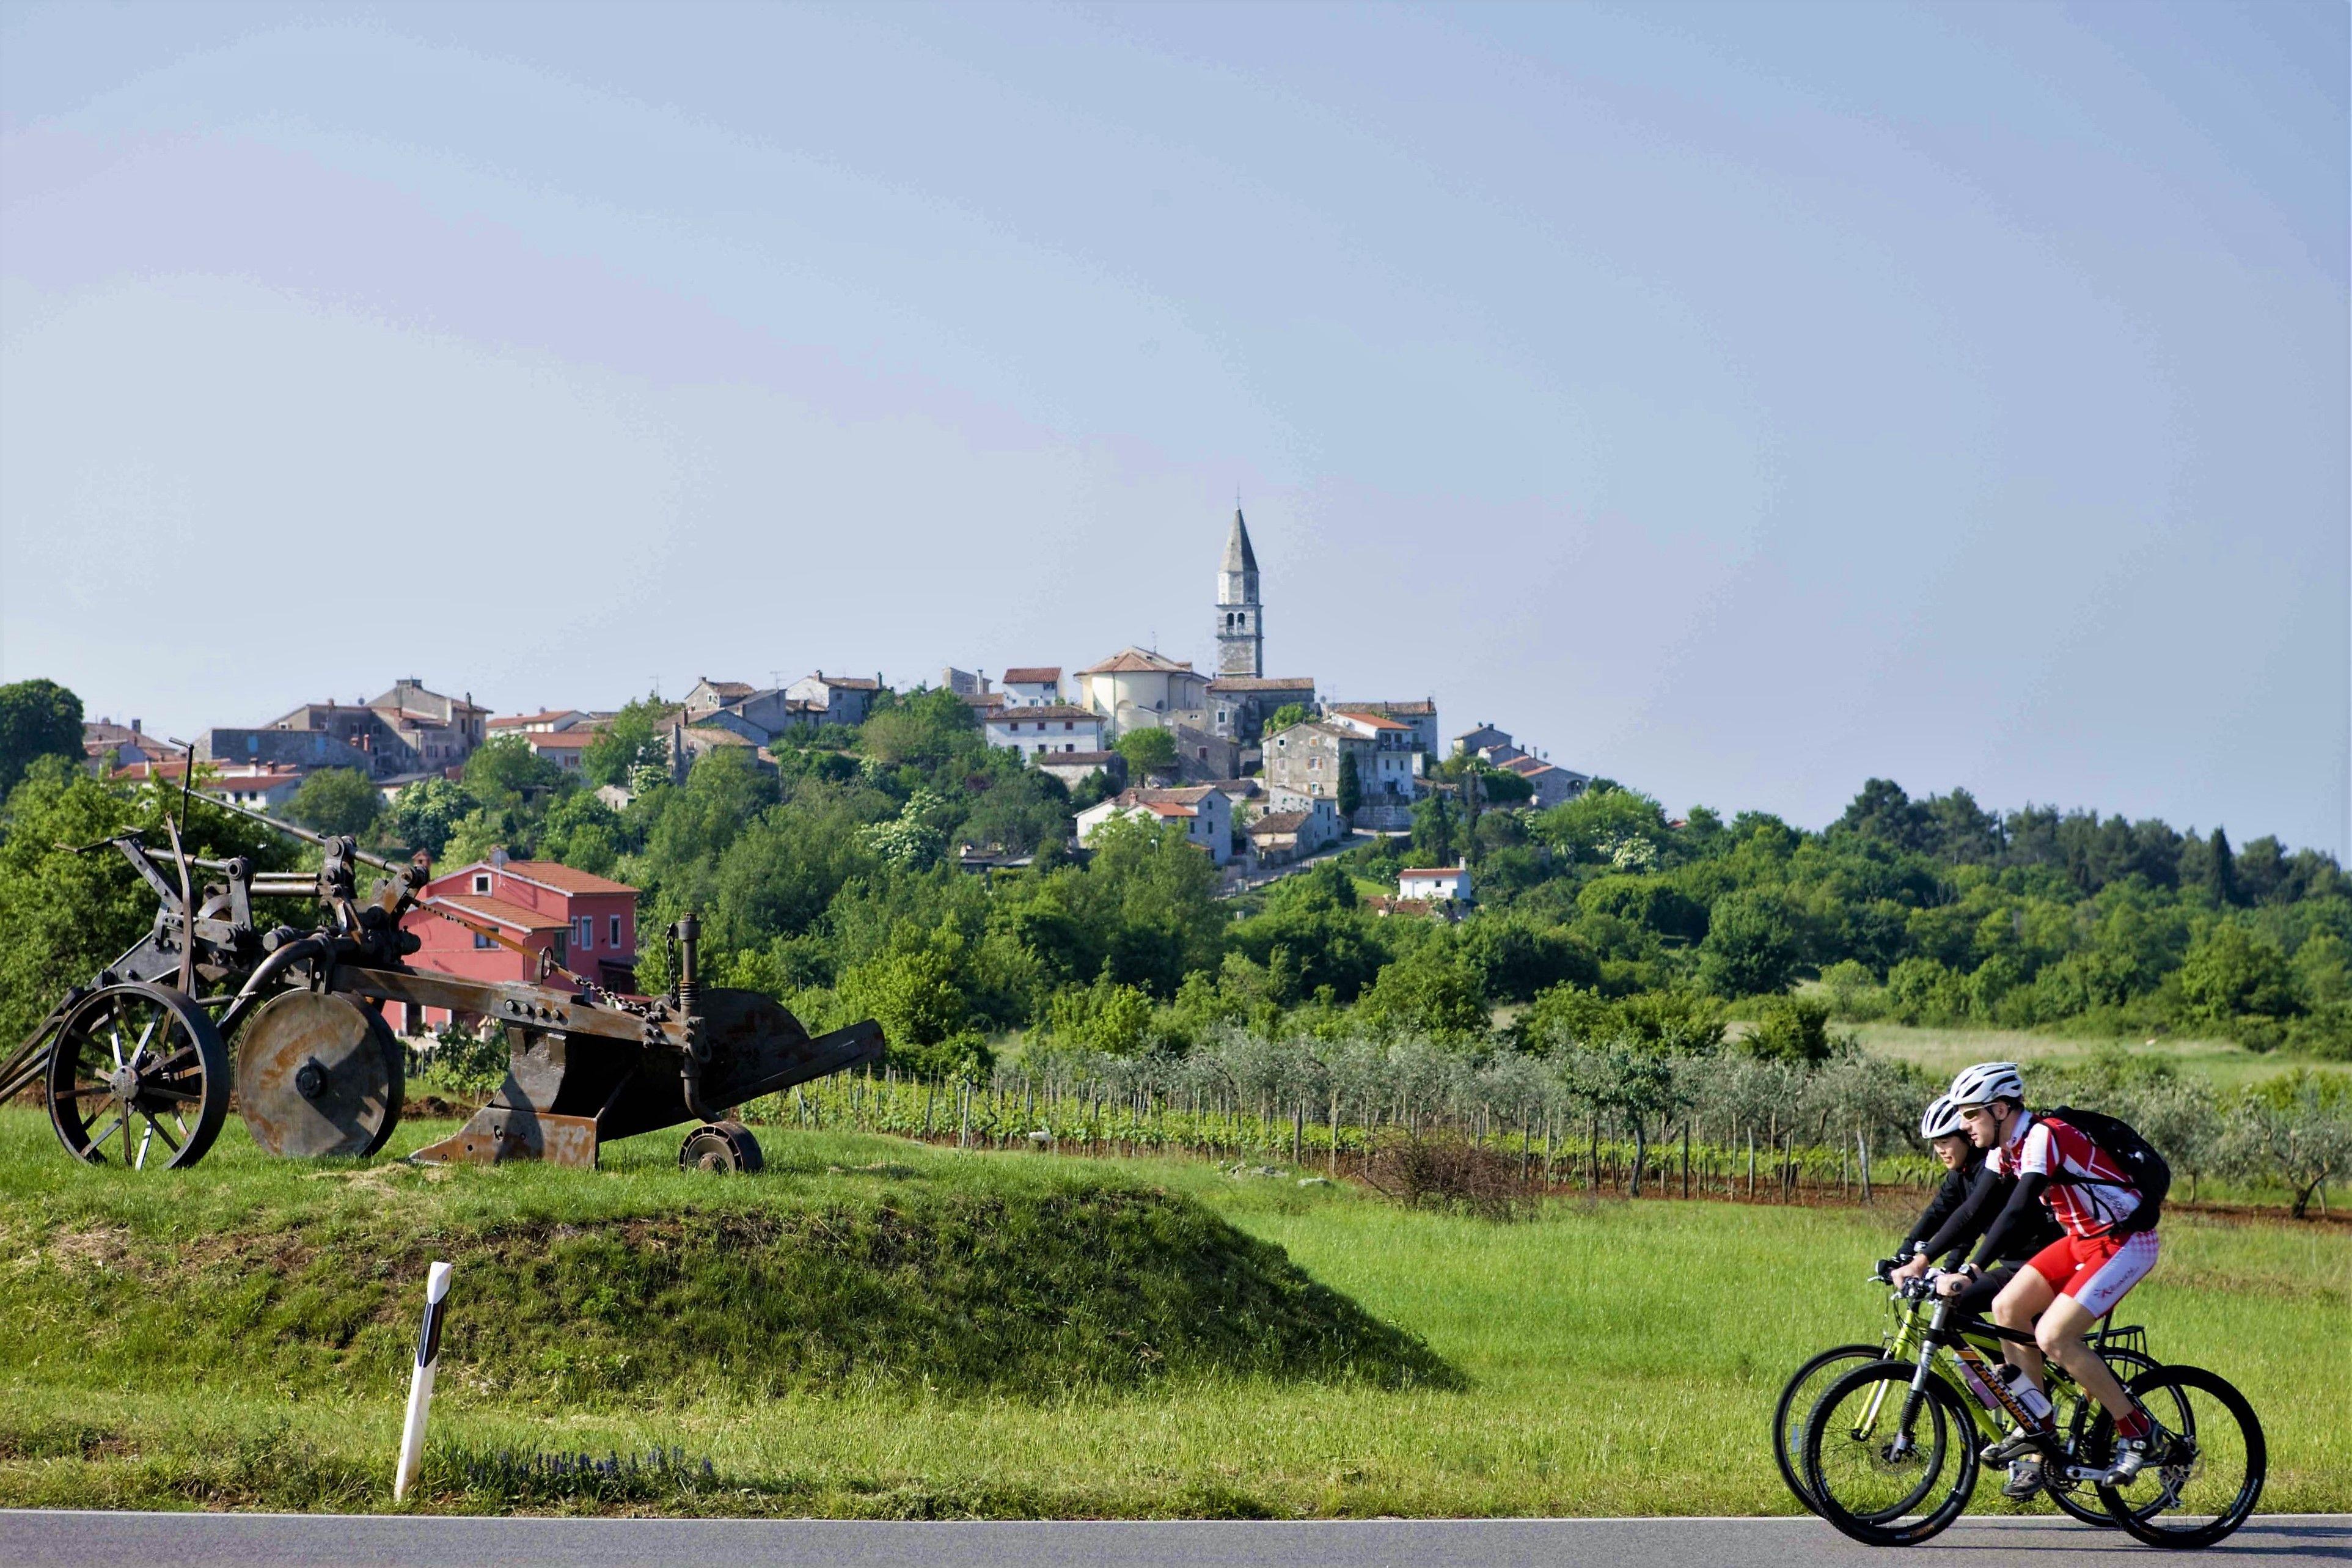 Pedal The Idyllic Istria Peninsula Istria Croatia Bike Tours Here Https Www Roaradventures Com Tours A 62 Sb Best Match Q Bike Tour Adventure Tours Trip